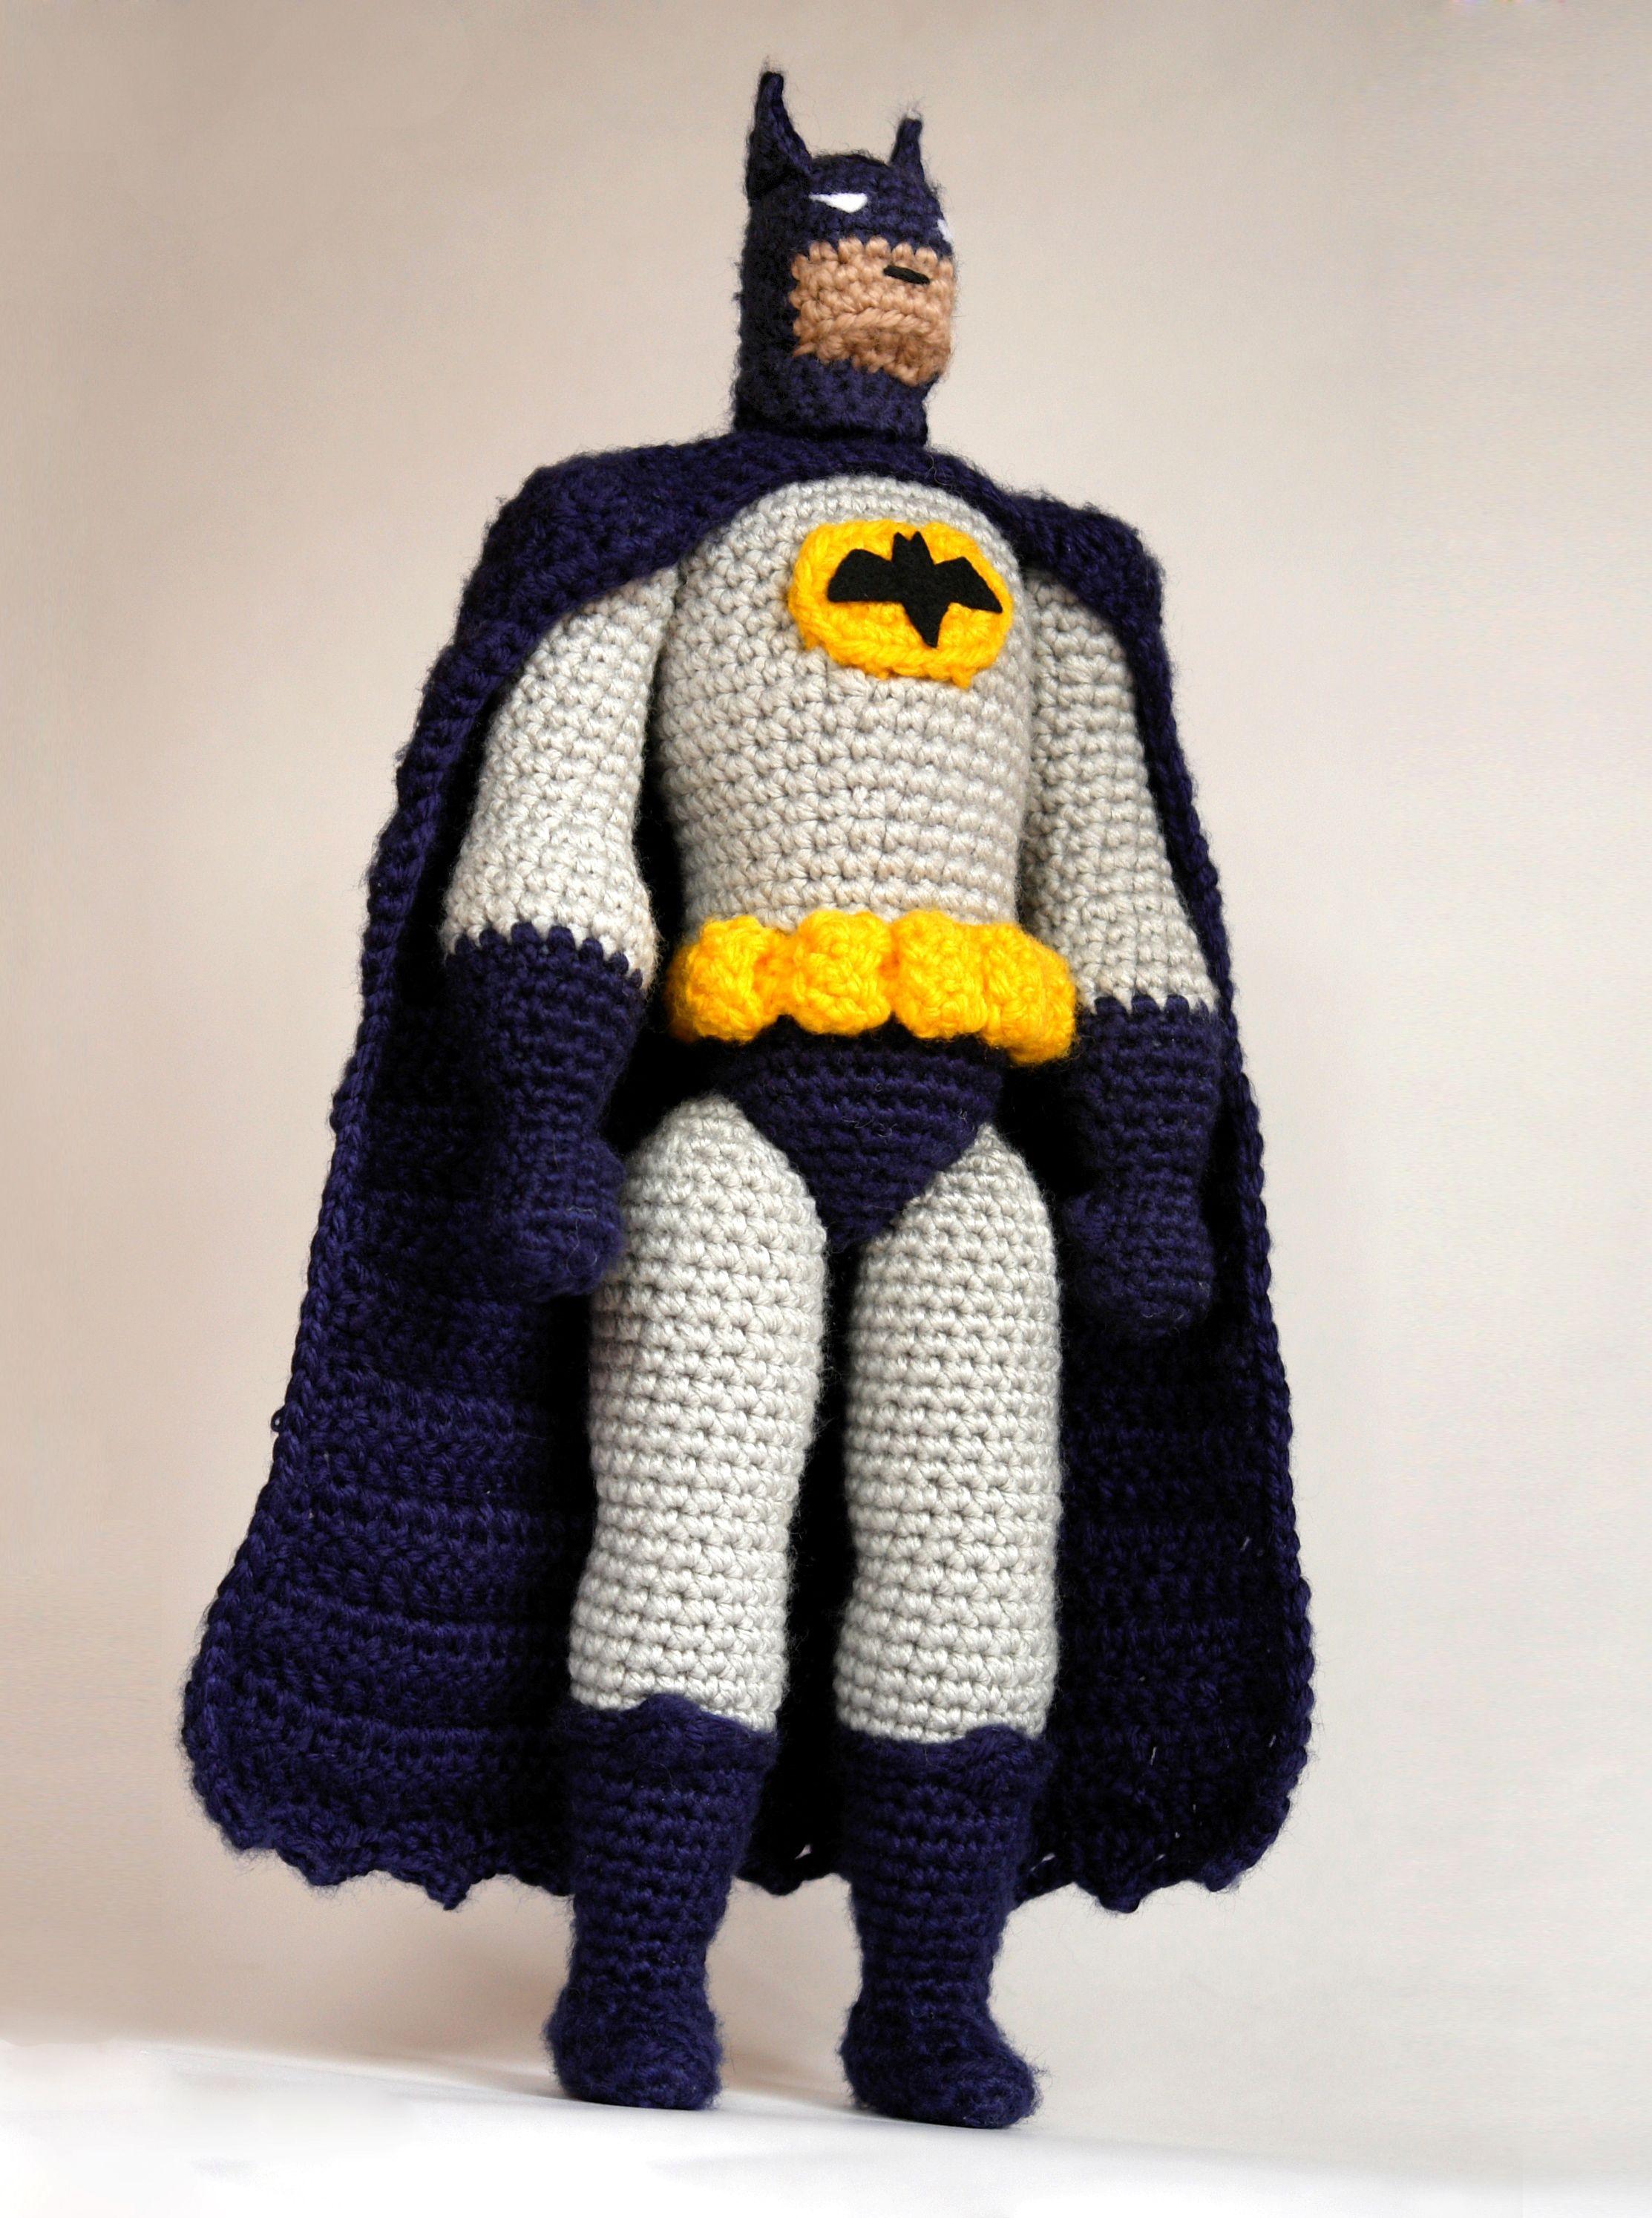 batman_crochet_amigurumi_doll_by_tinyalchemy-d8qjrld.jpg 2.226×2.988 ...